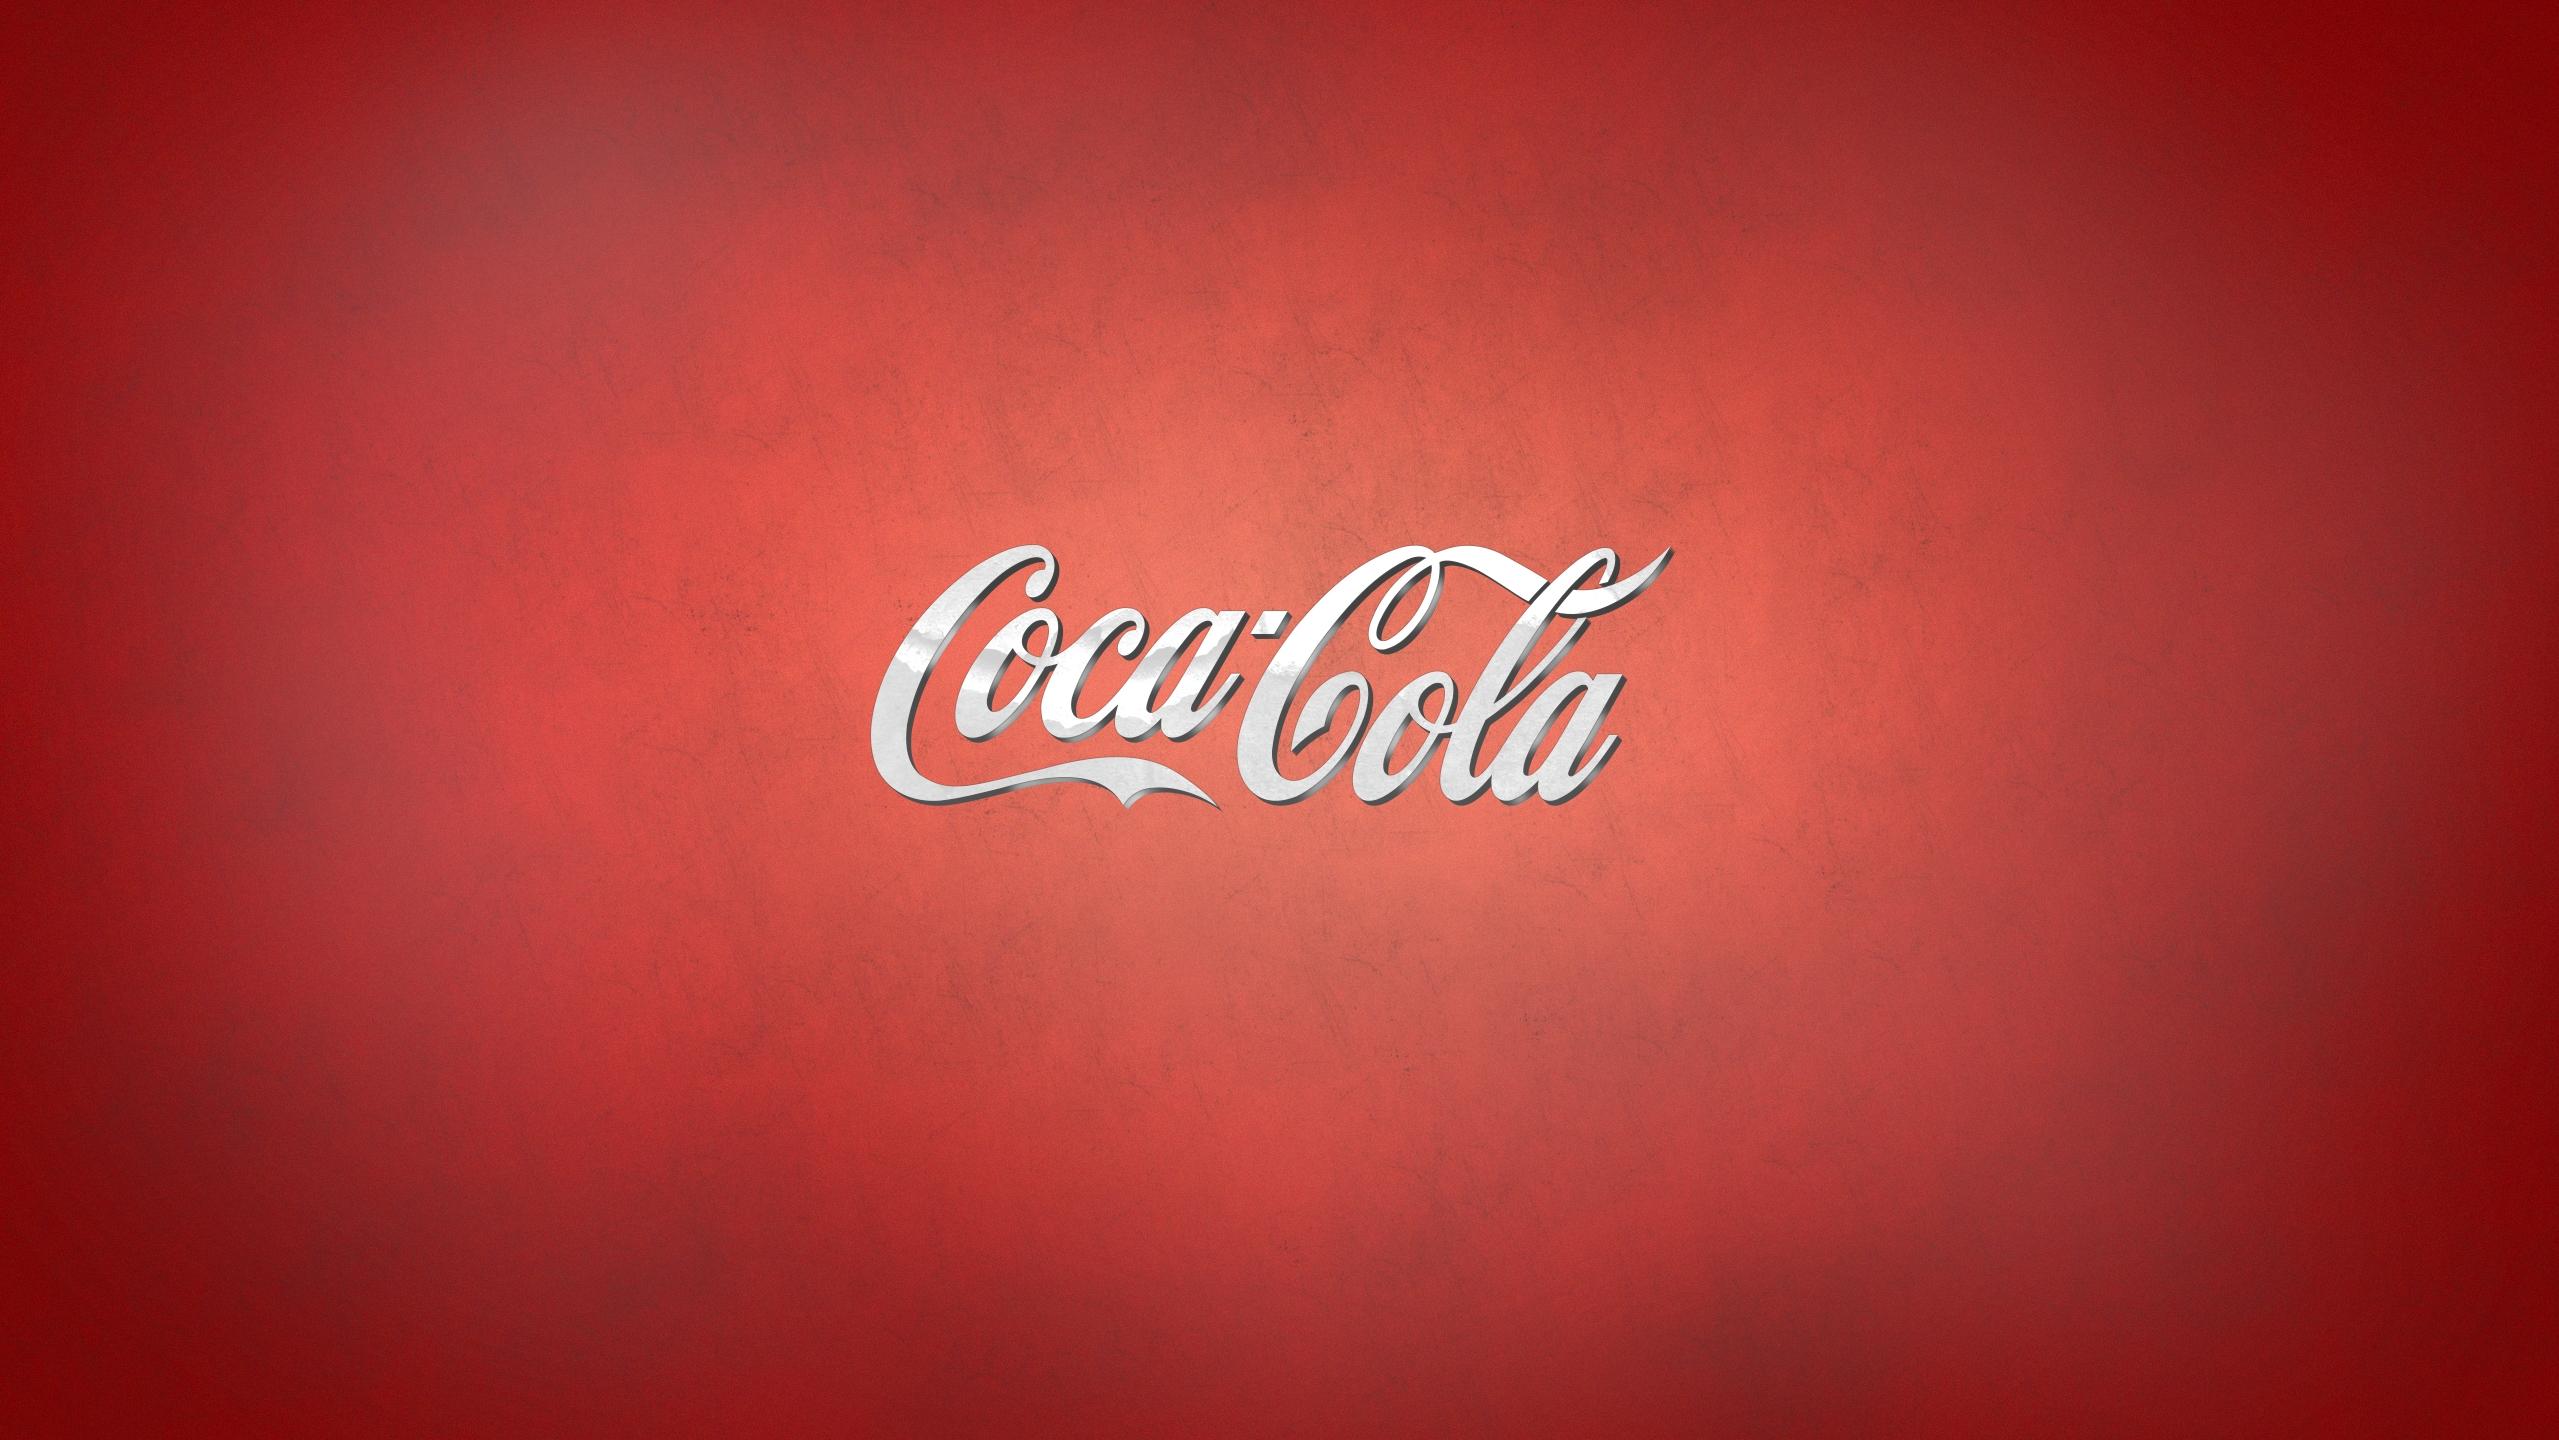 Products Coca Cola 2559x1440